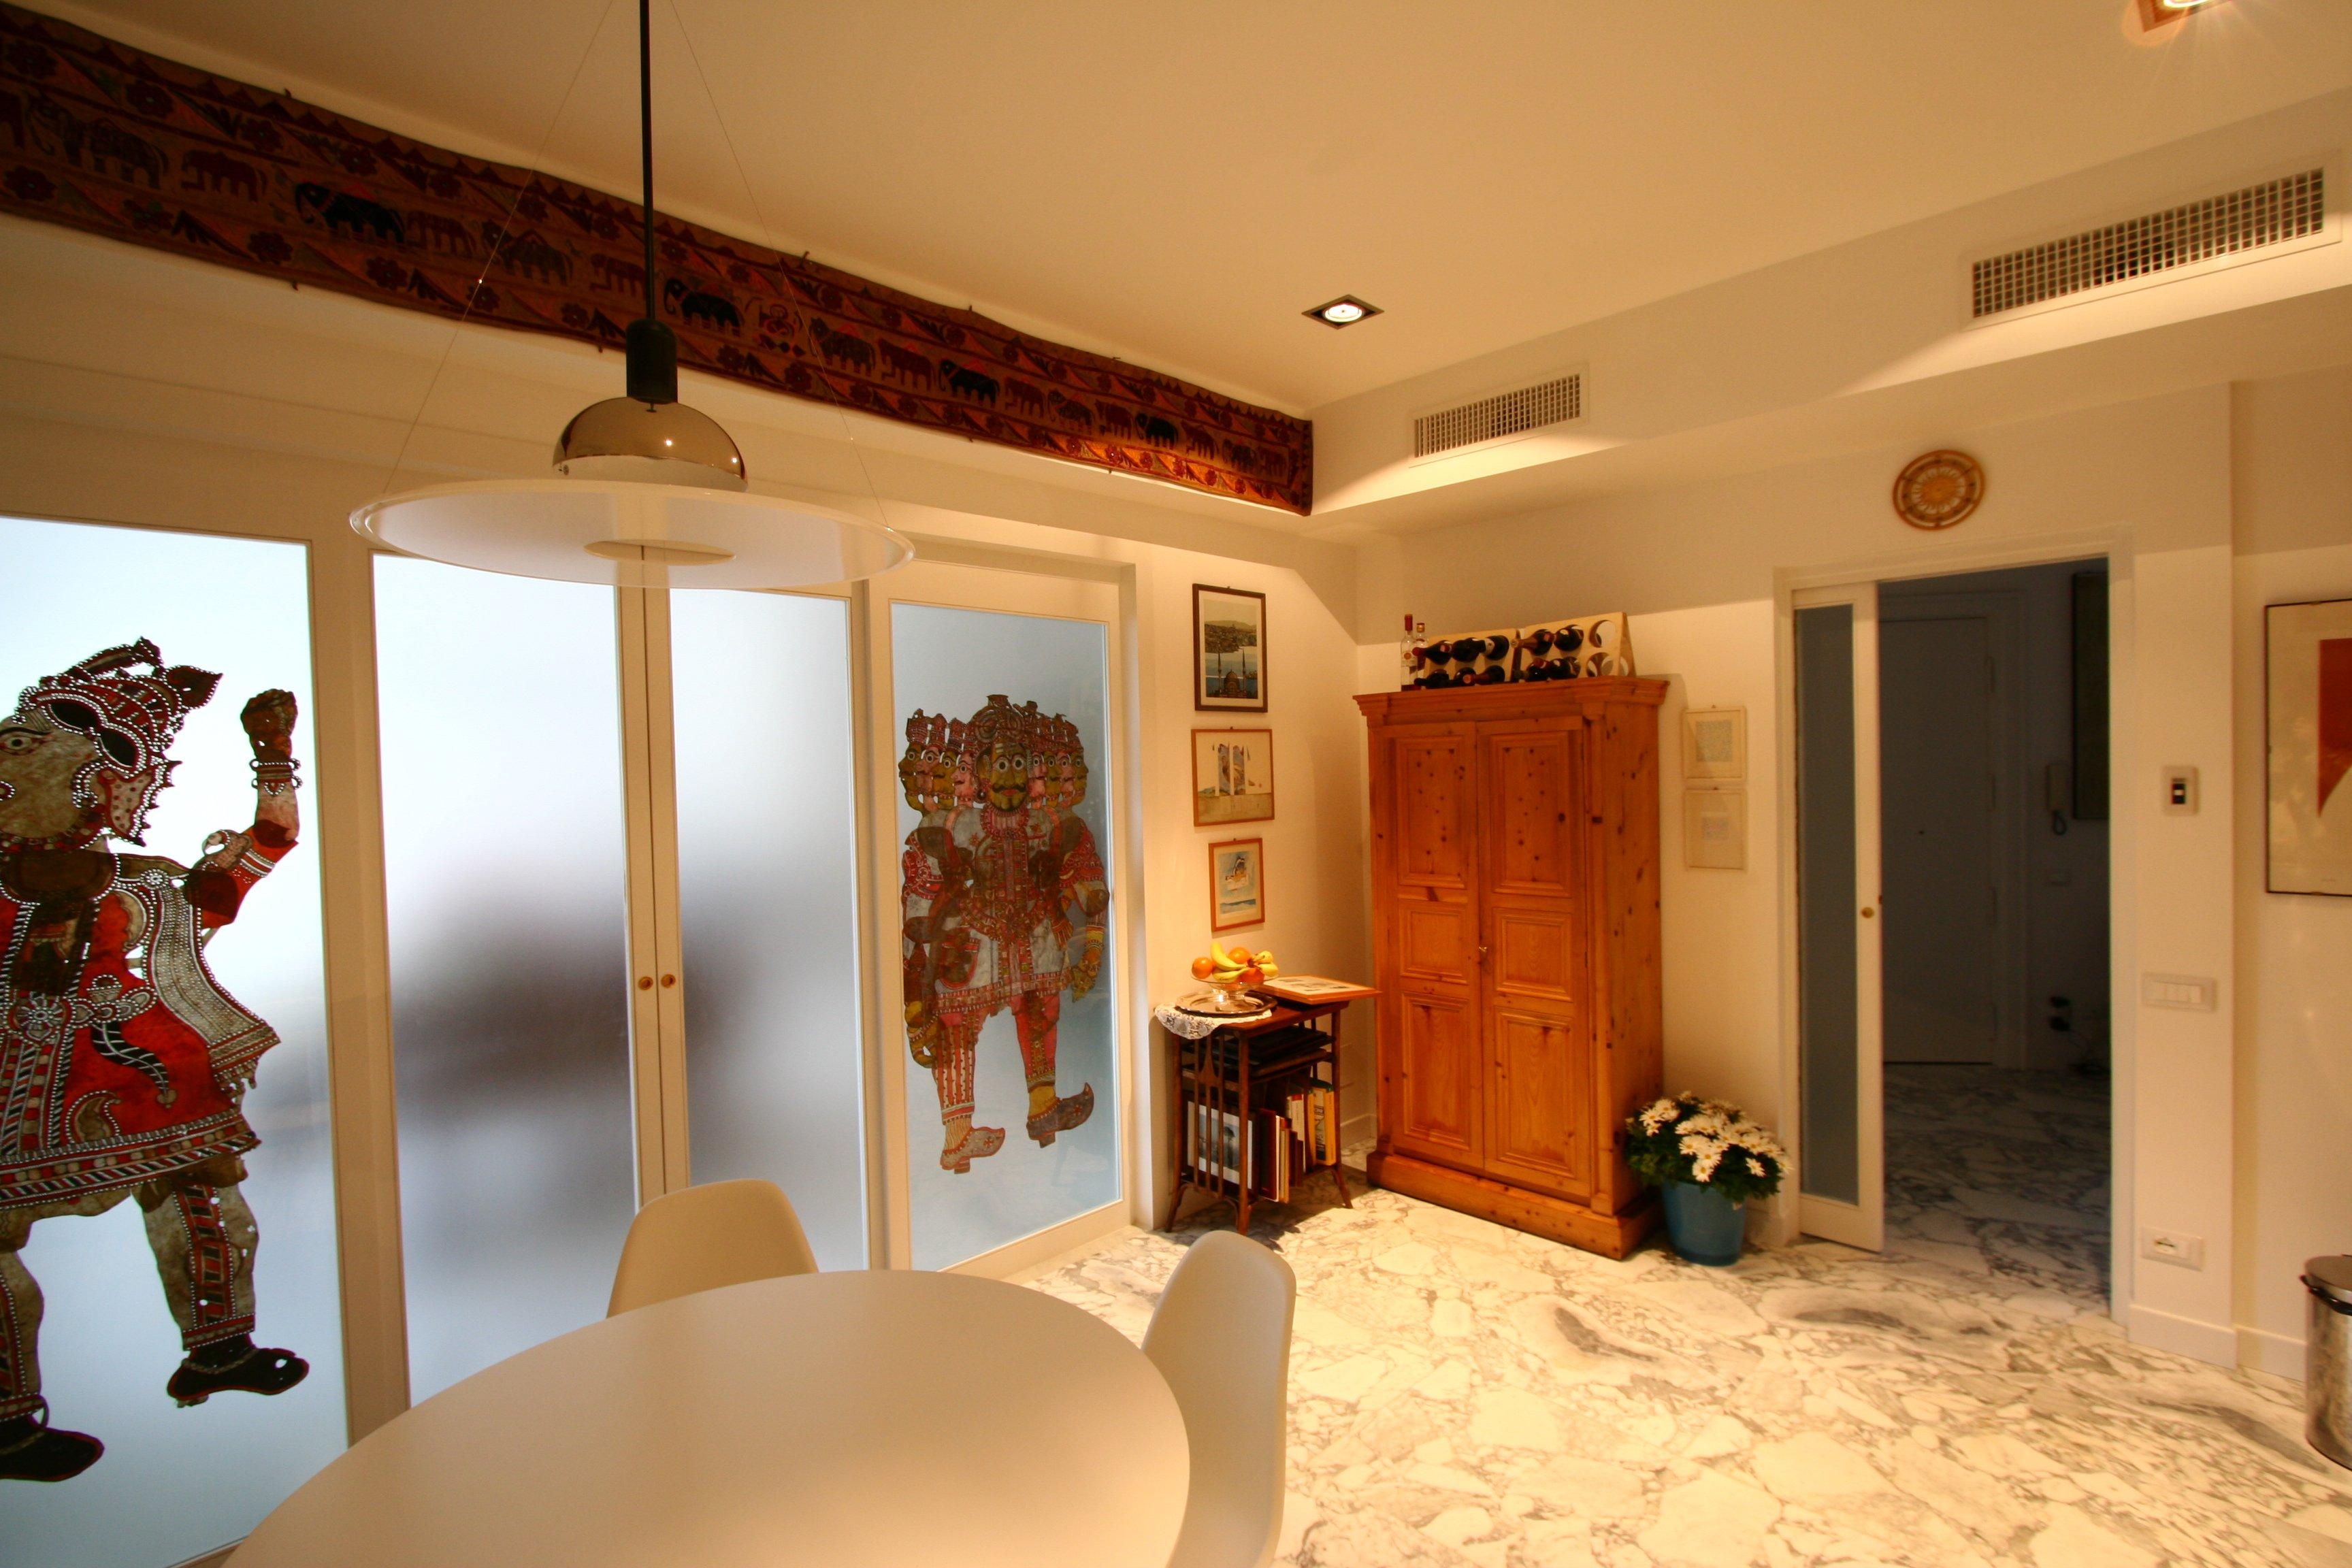 Image: Cucina foto 5 vista porta scorrevole ingresso